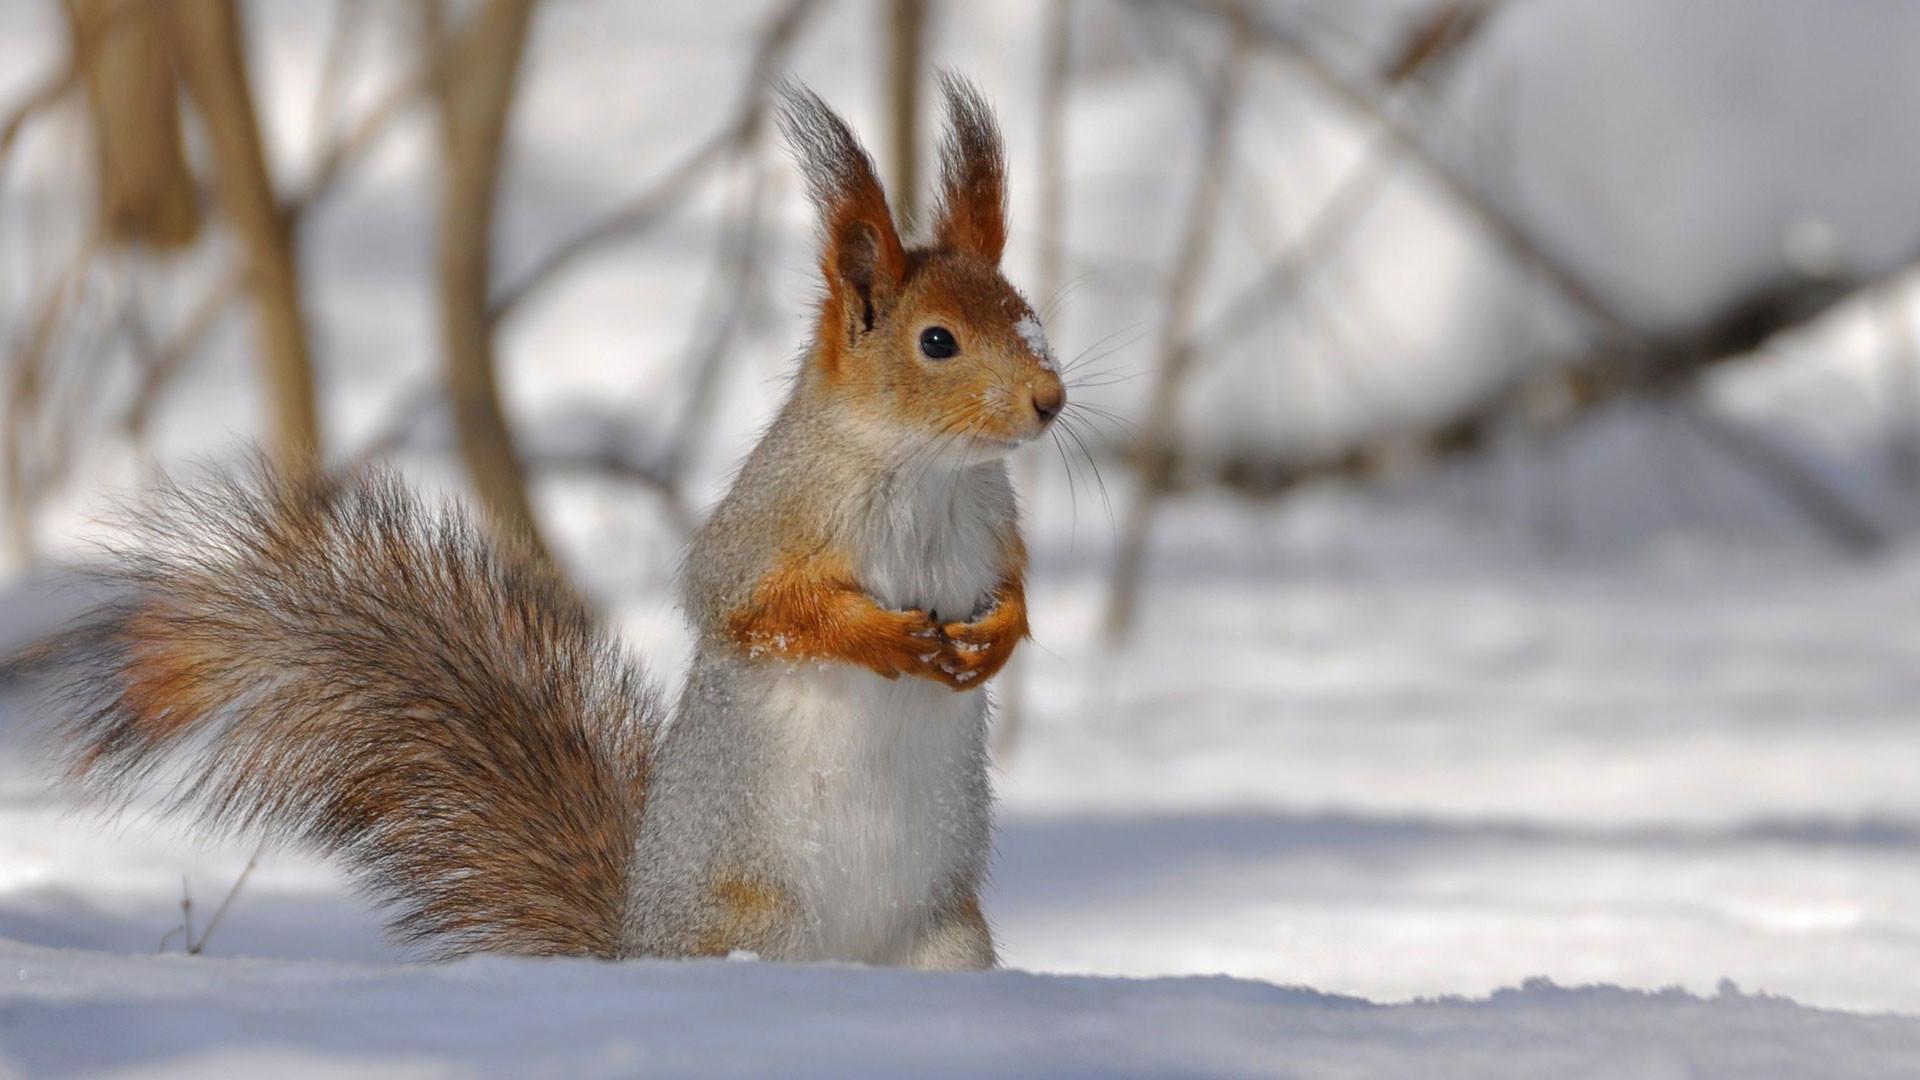 hd pics photos cute squirrel snow ice winter polar animals hd quality  desktop background wallpaper